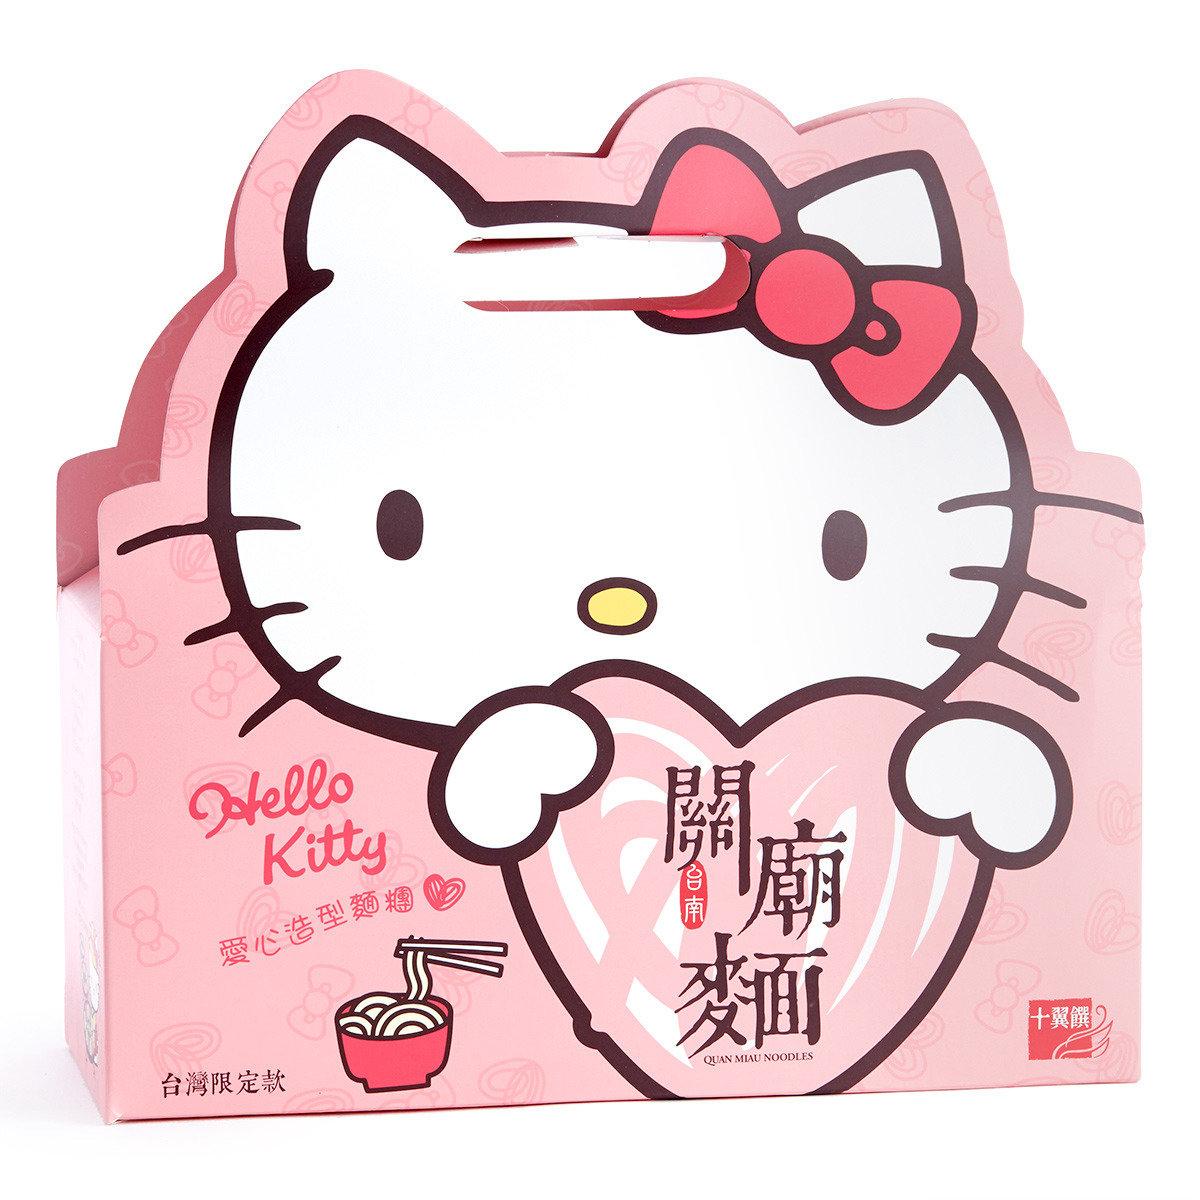 Hello Kitty關廟麵禮盒(關廟麵, 蕎麥關廟麵, 黑芝麻關廟麵) (賞味期限: 2016年11月09日)